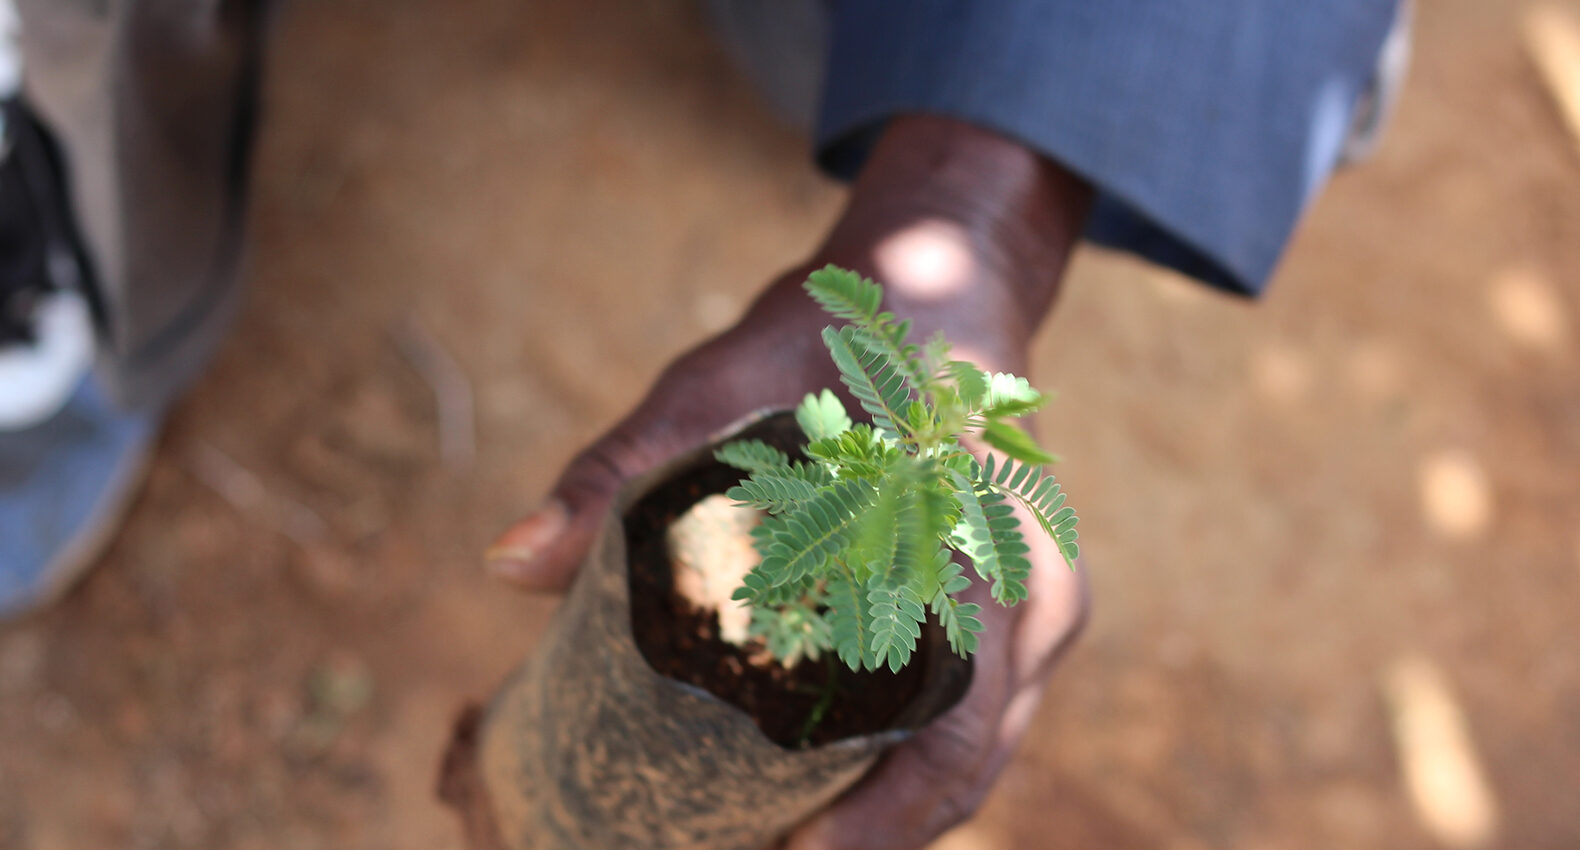 Planting new tree Tanzania Trees for the future